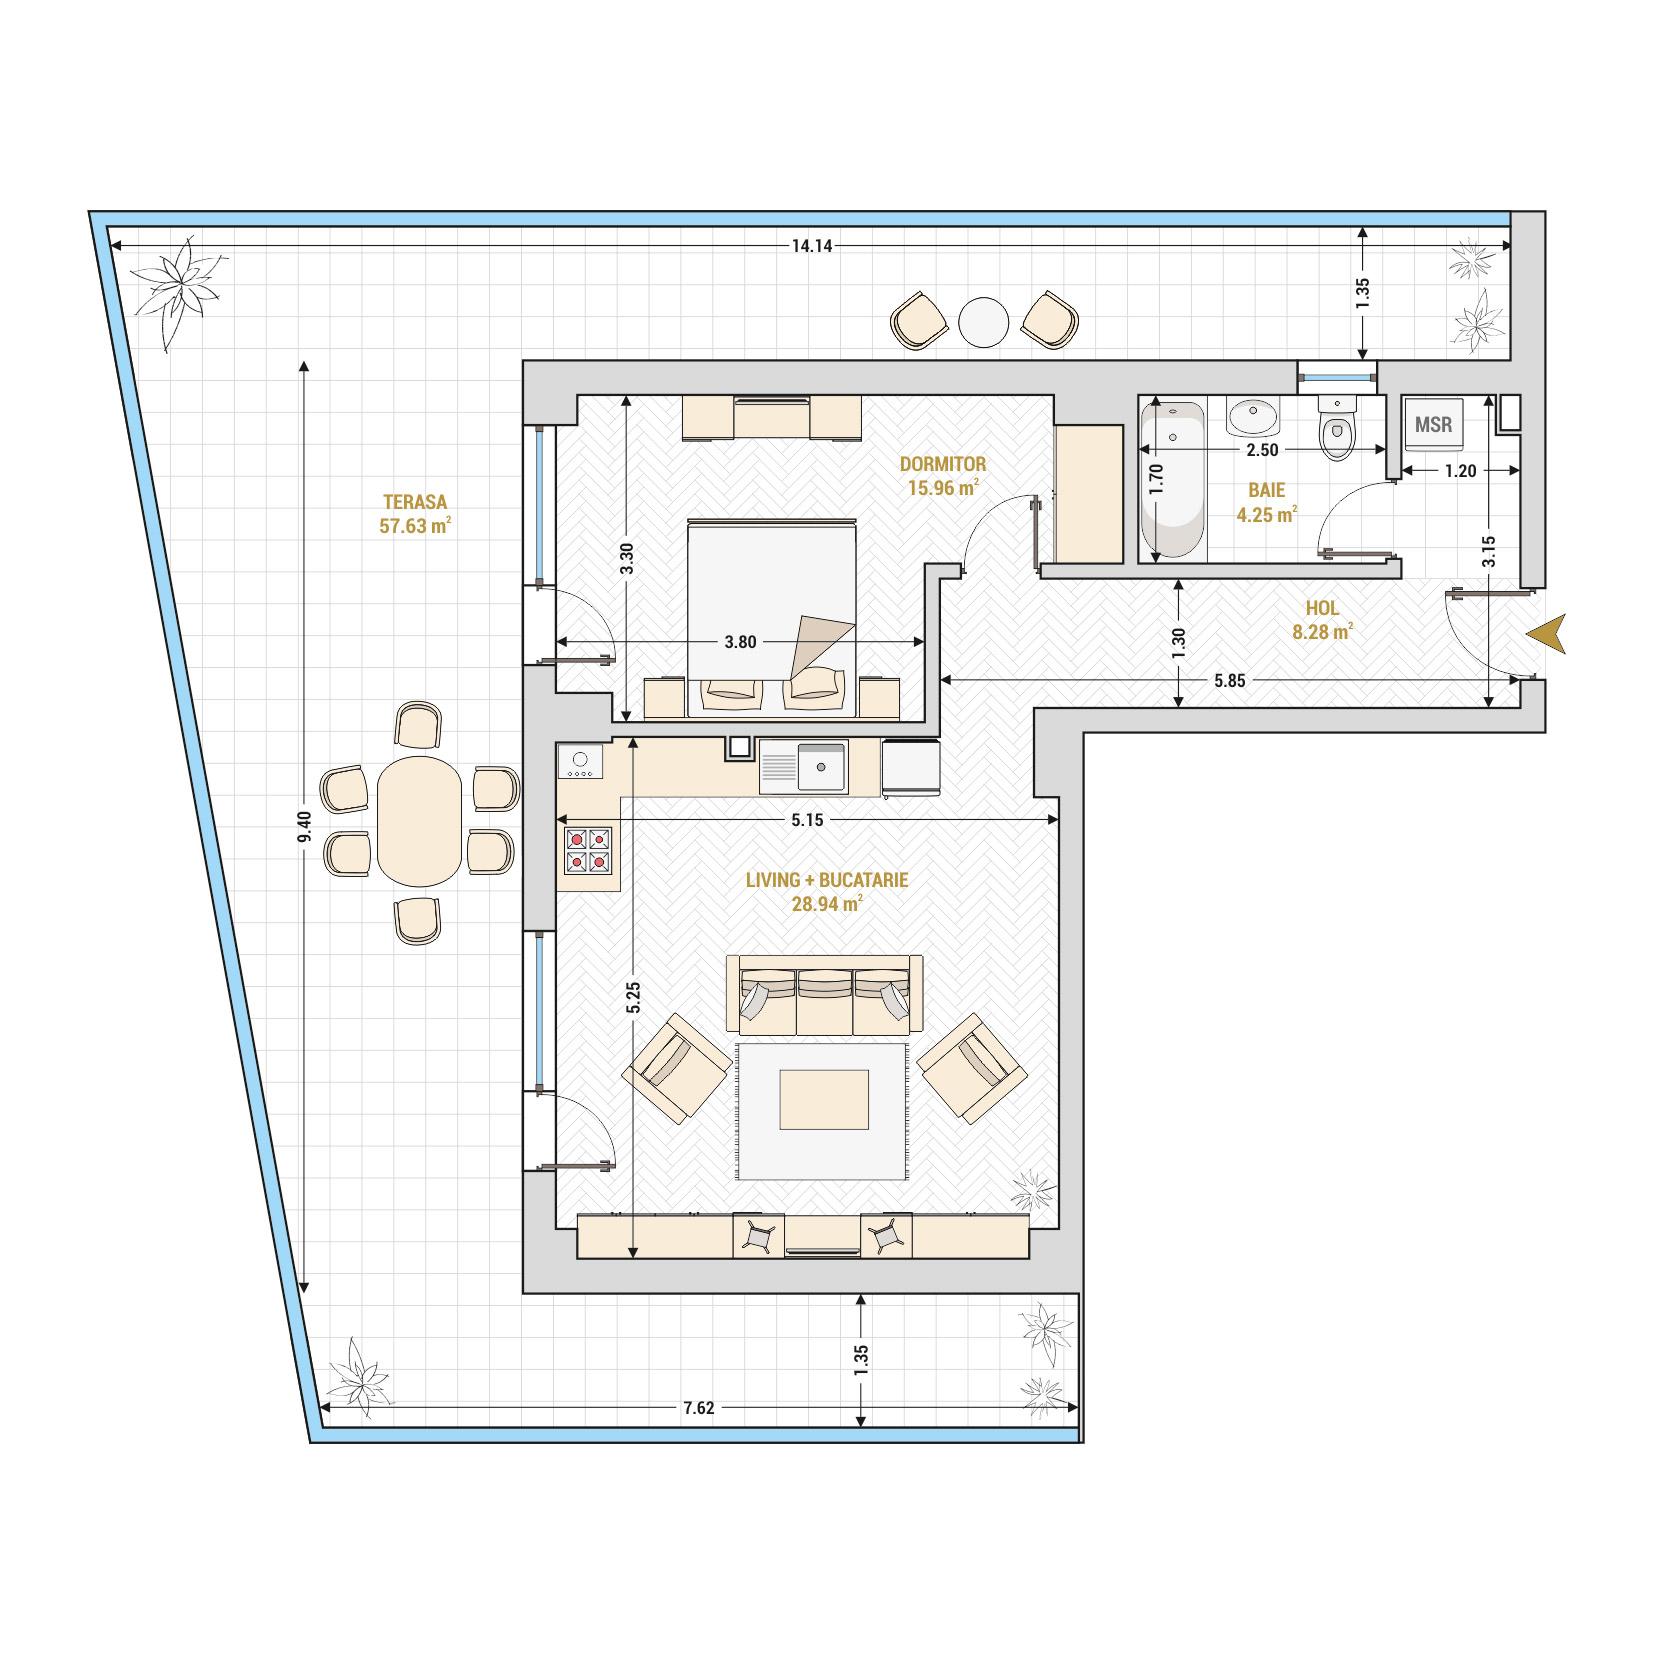 Apartament 2 camere de vanzare Bucuresti - Catedral Residence - Marriott, Piata Unirii, 13 Septembrie, Izvor - Tip 8 - T1